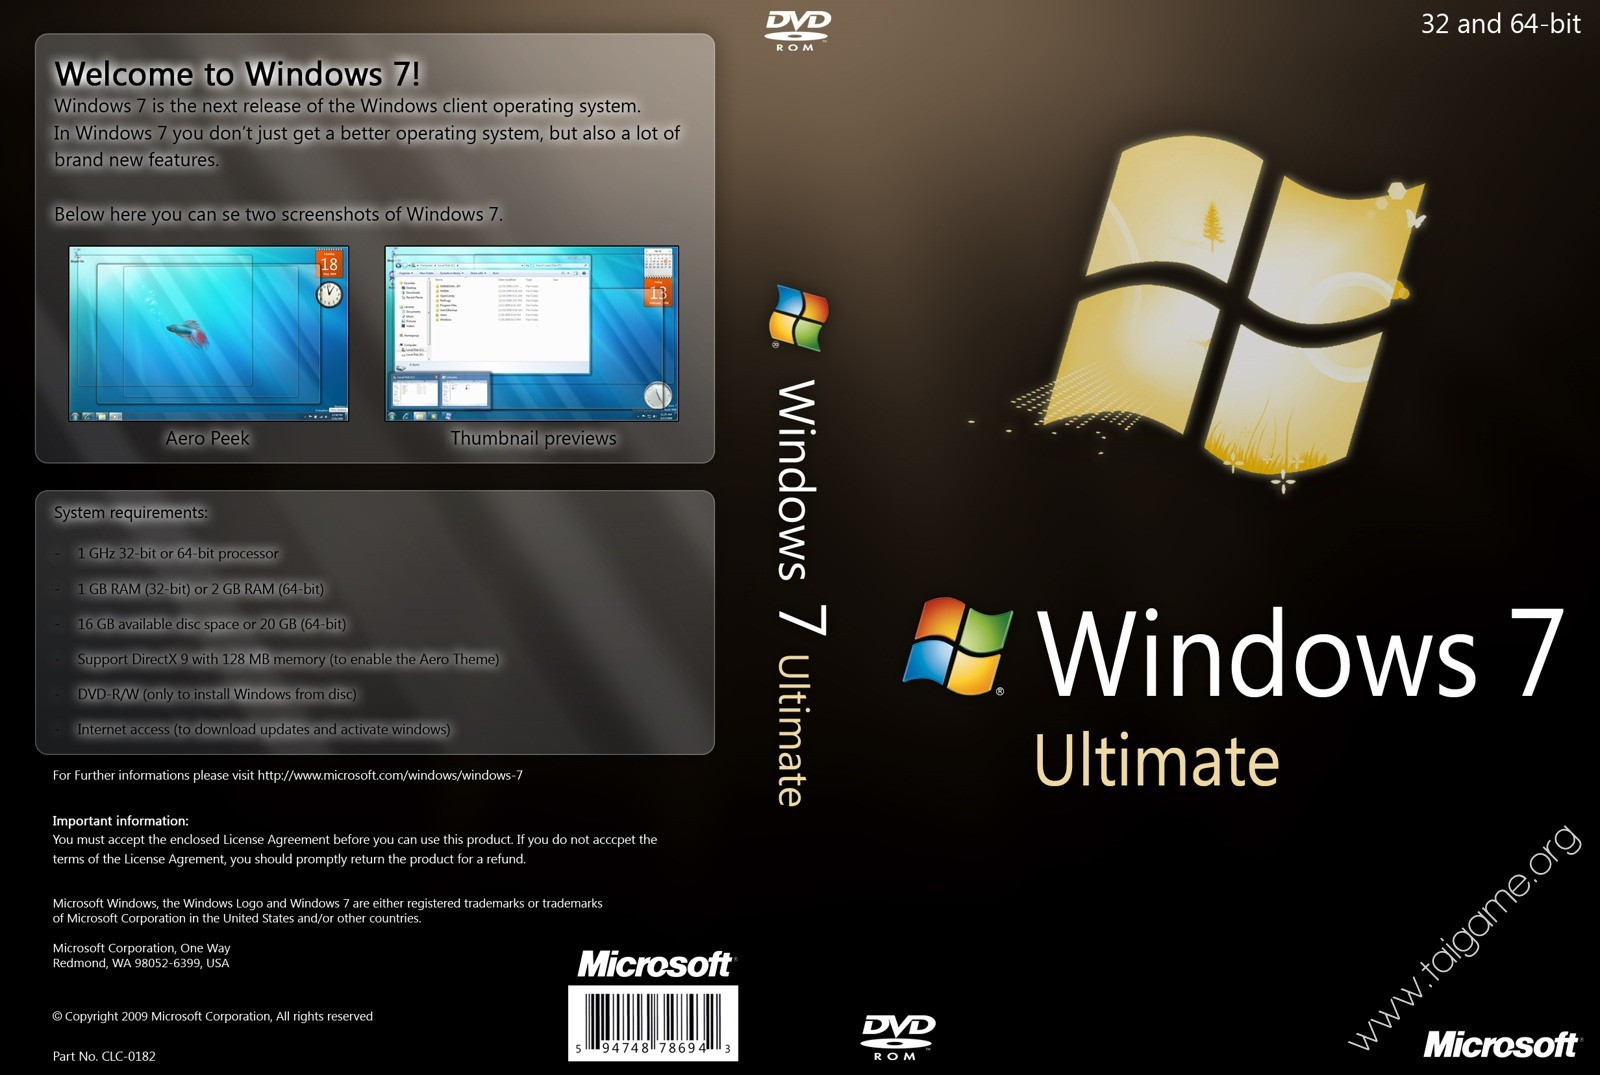 windows 7 ultimate sp1 64 bit download free full games applications games. Black Bedroom Furniture Sets. Home Design Ideas